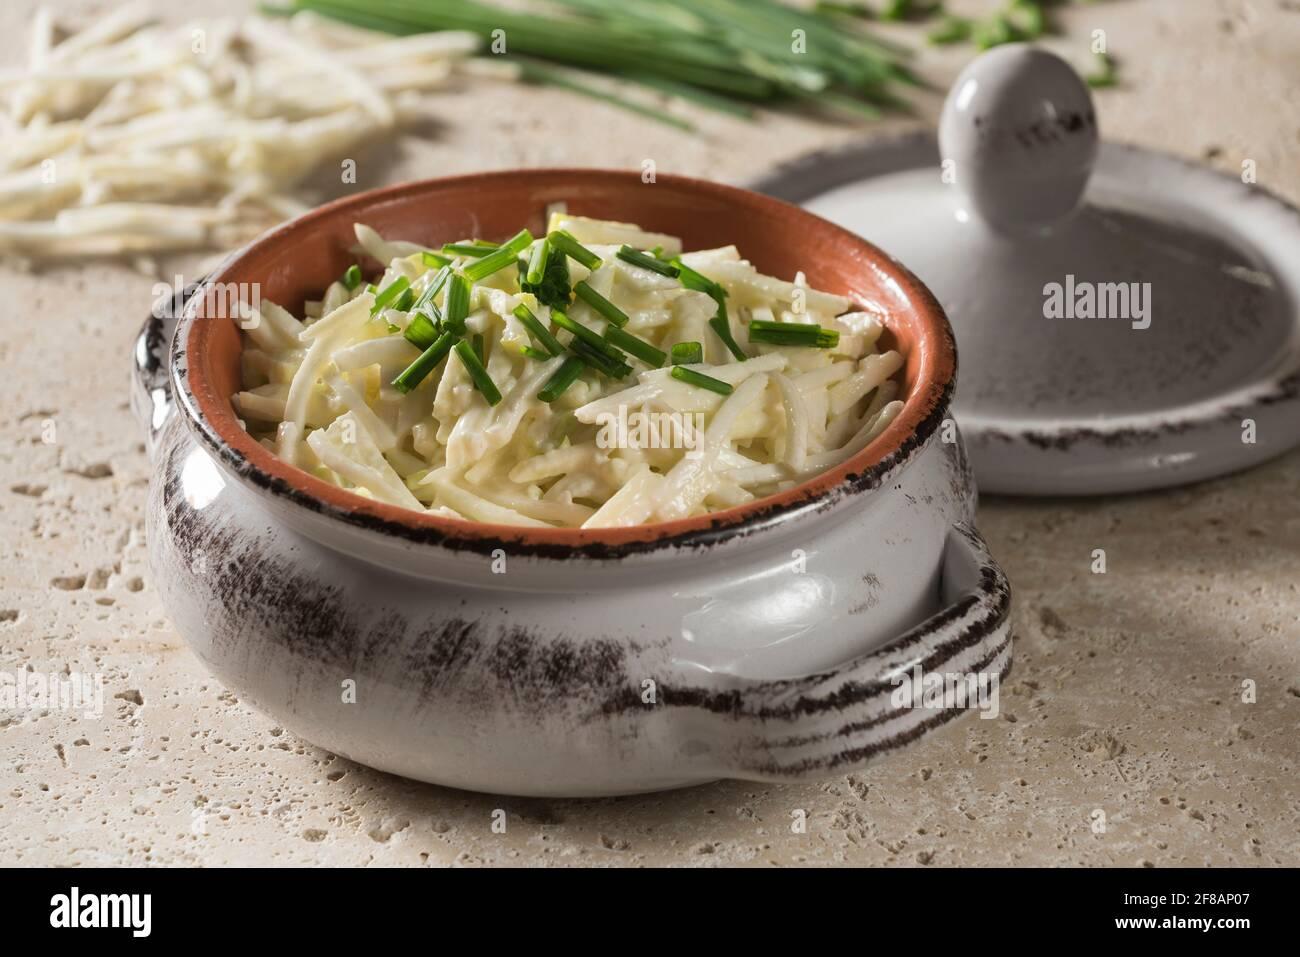 Celeriac remoulade. Celery root salad in mustard mayonnaise. Stock Photo